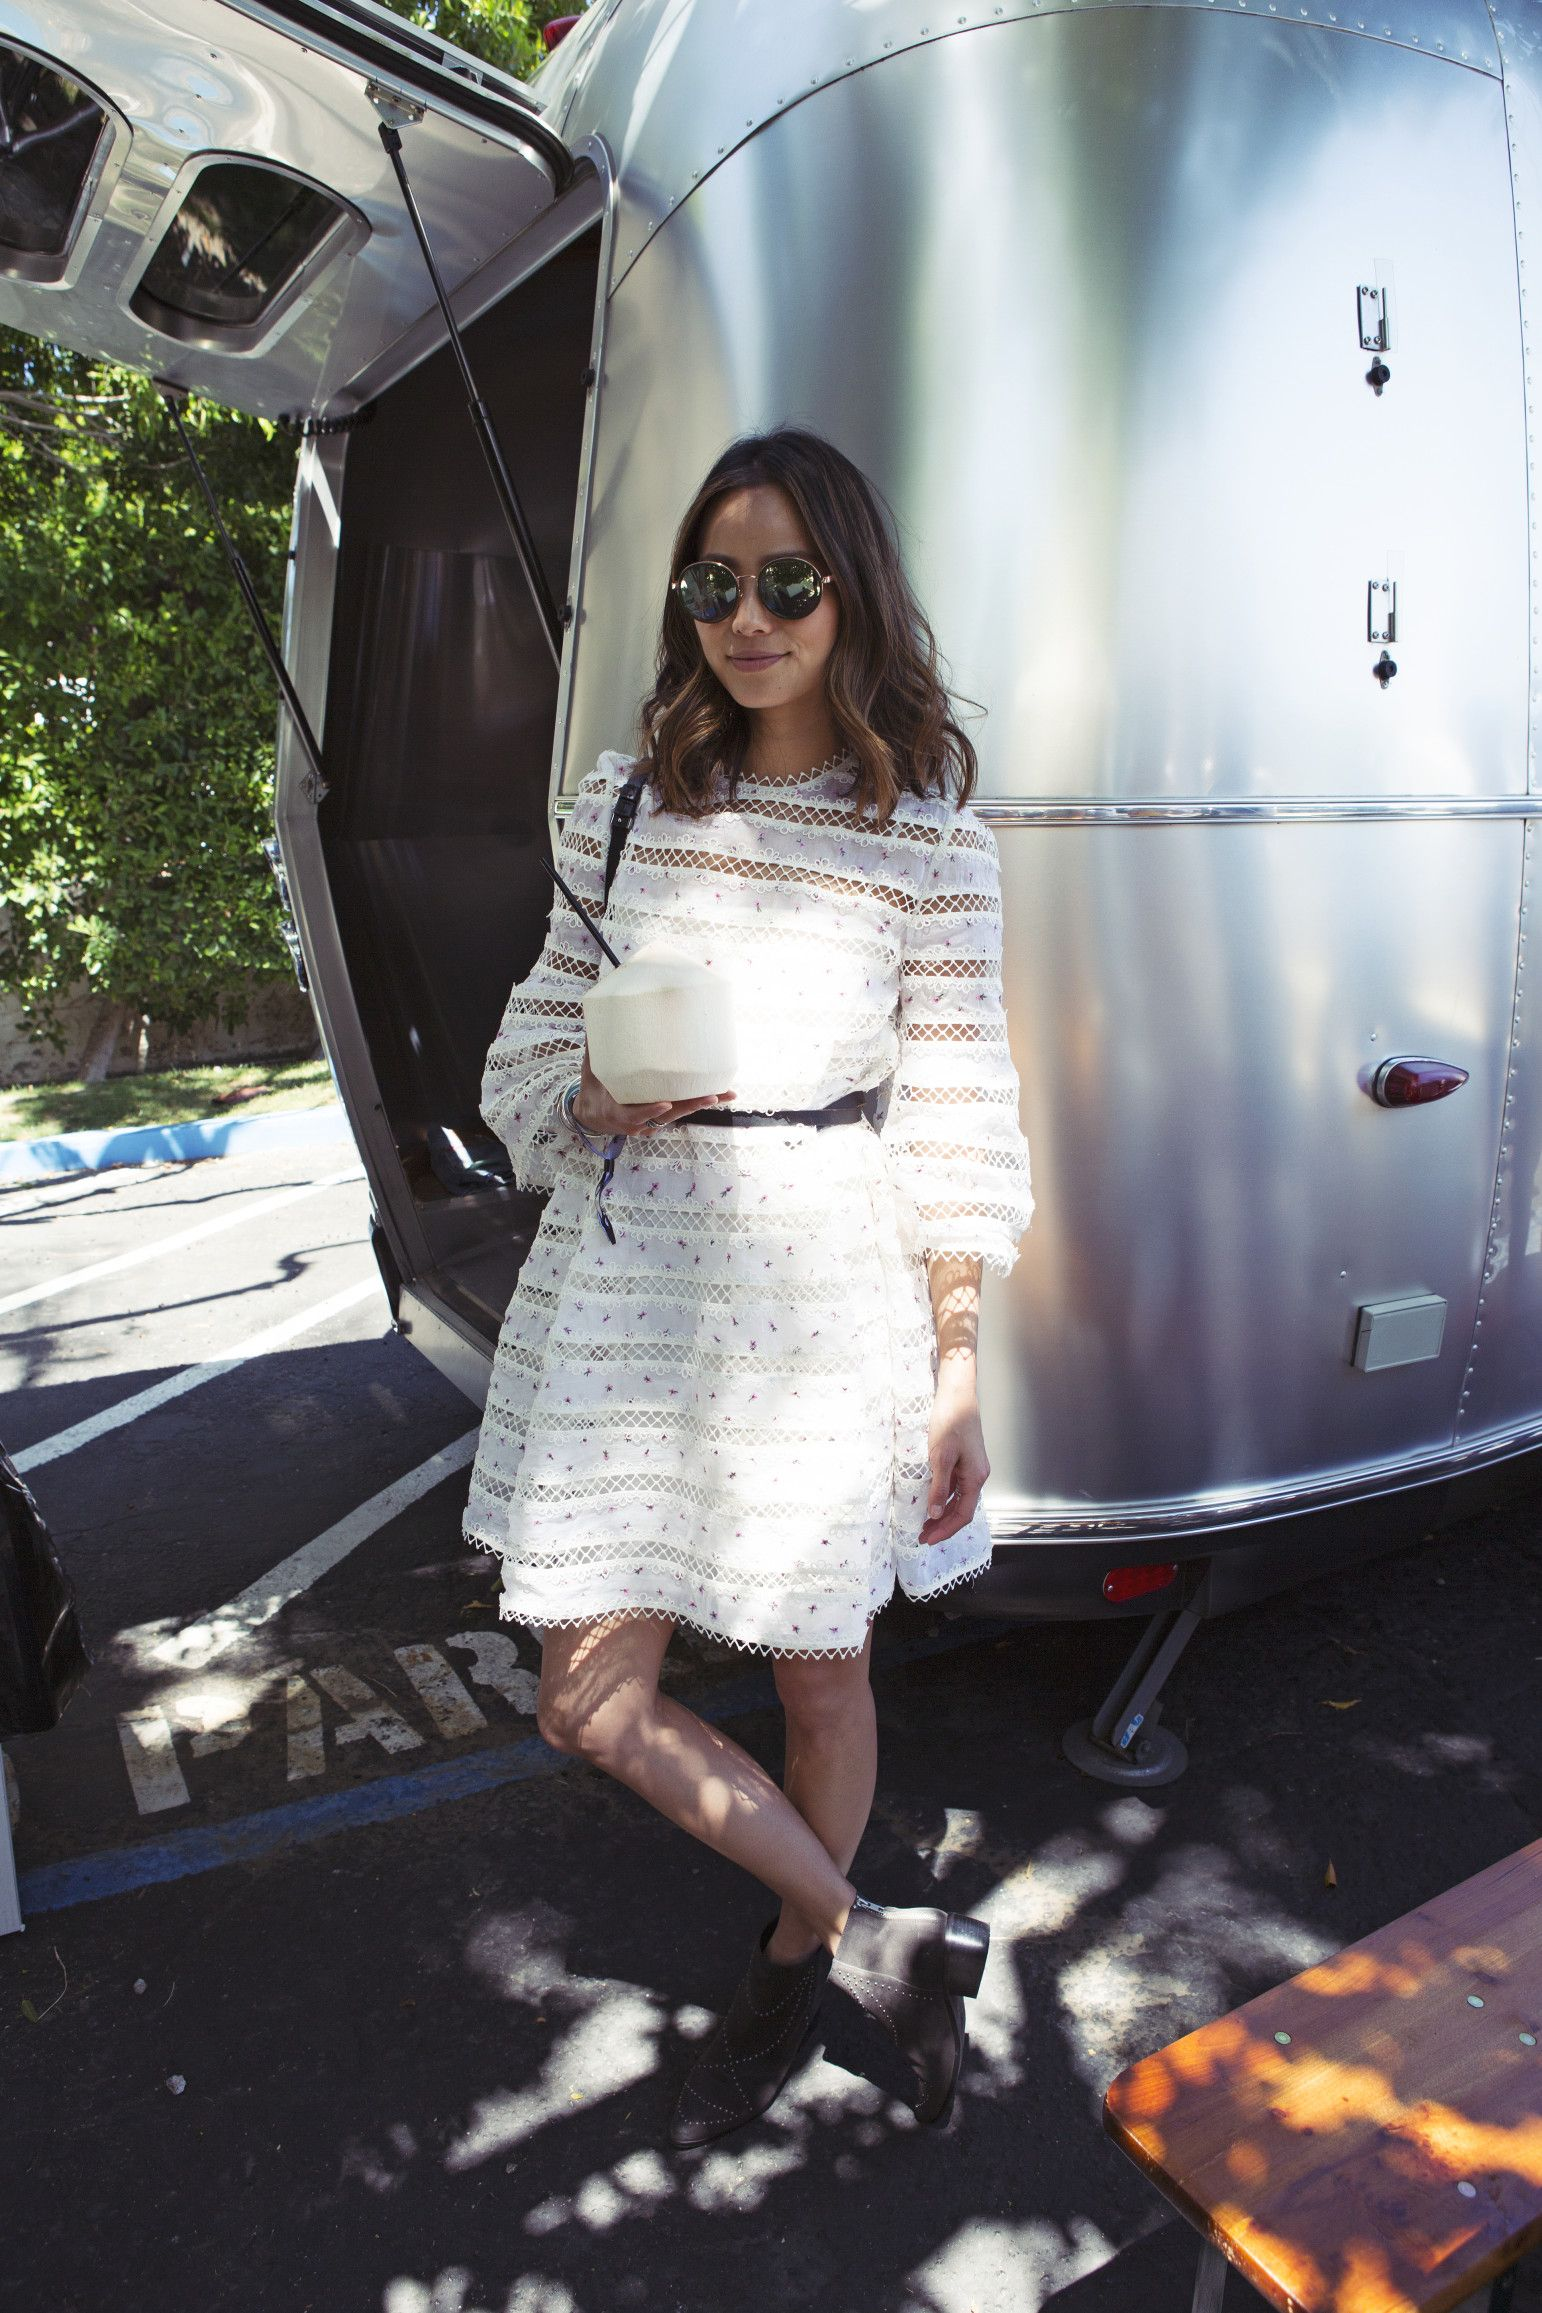 Coachella Street Style 2016: The Best Festival Fashion  - Coachella Street Style-Wmag